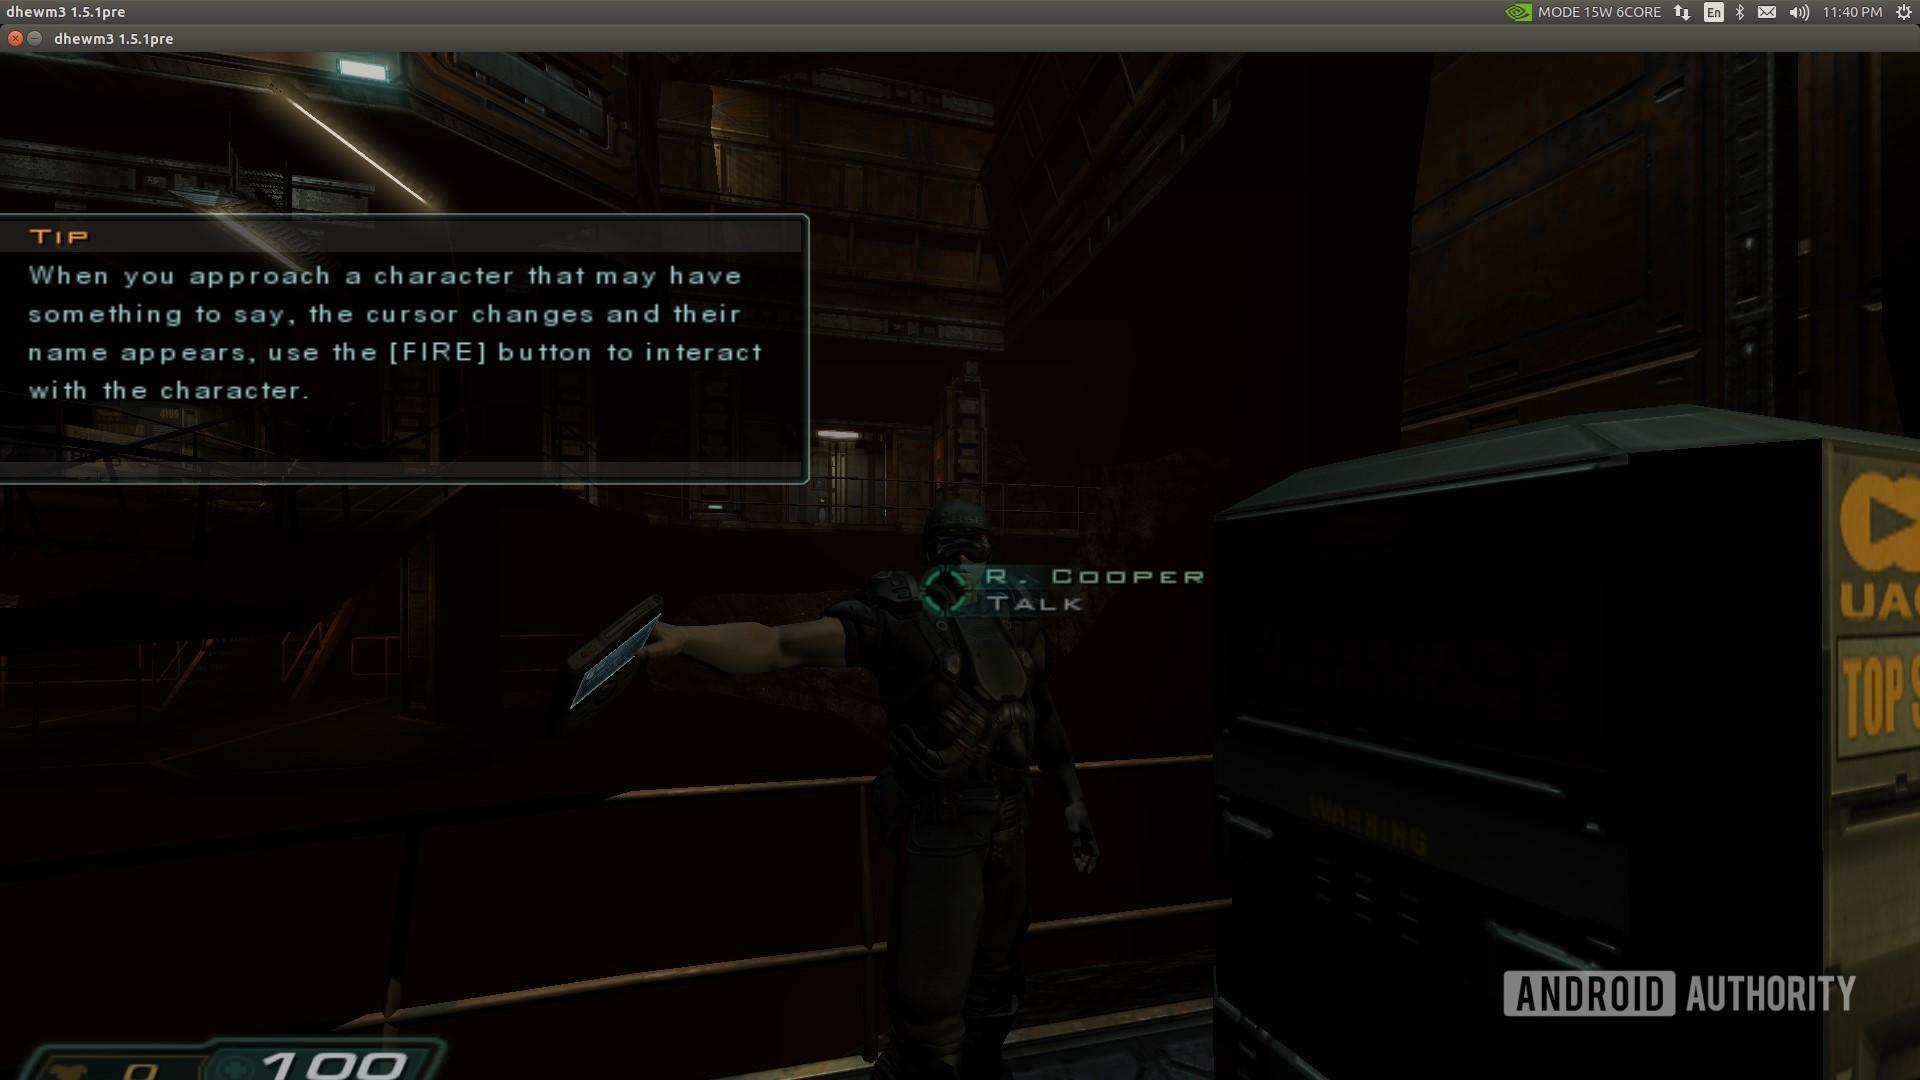 Jetson Xavier NX running Doom 3 in a window